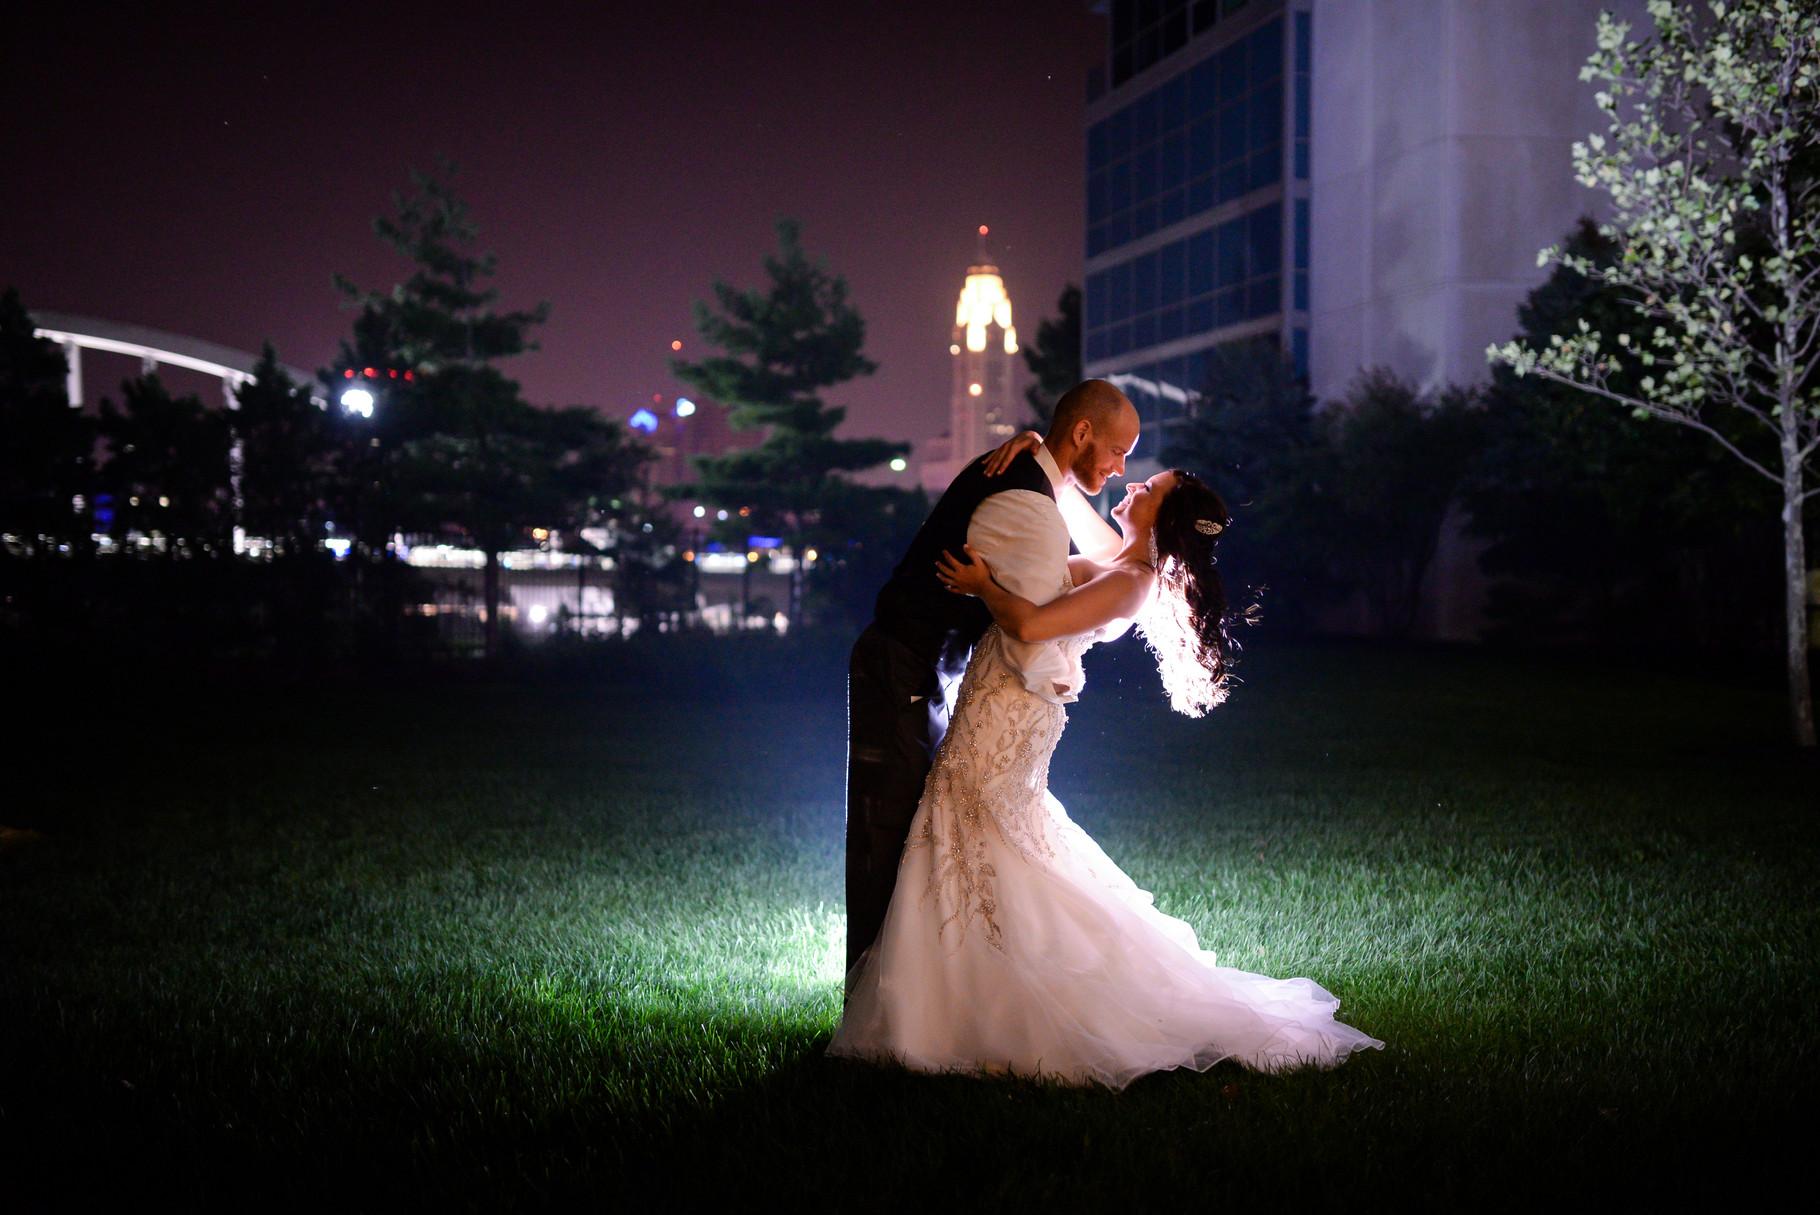 Sarah and Jeff night lighting wedding photo Downtown columbus, Ohio Mirnova